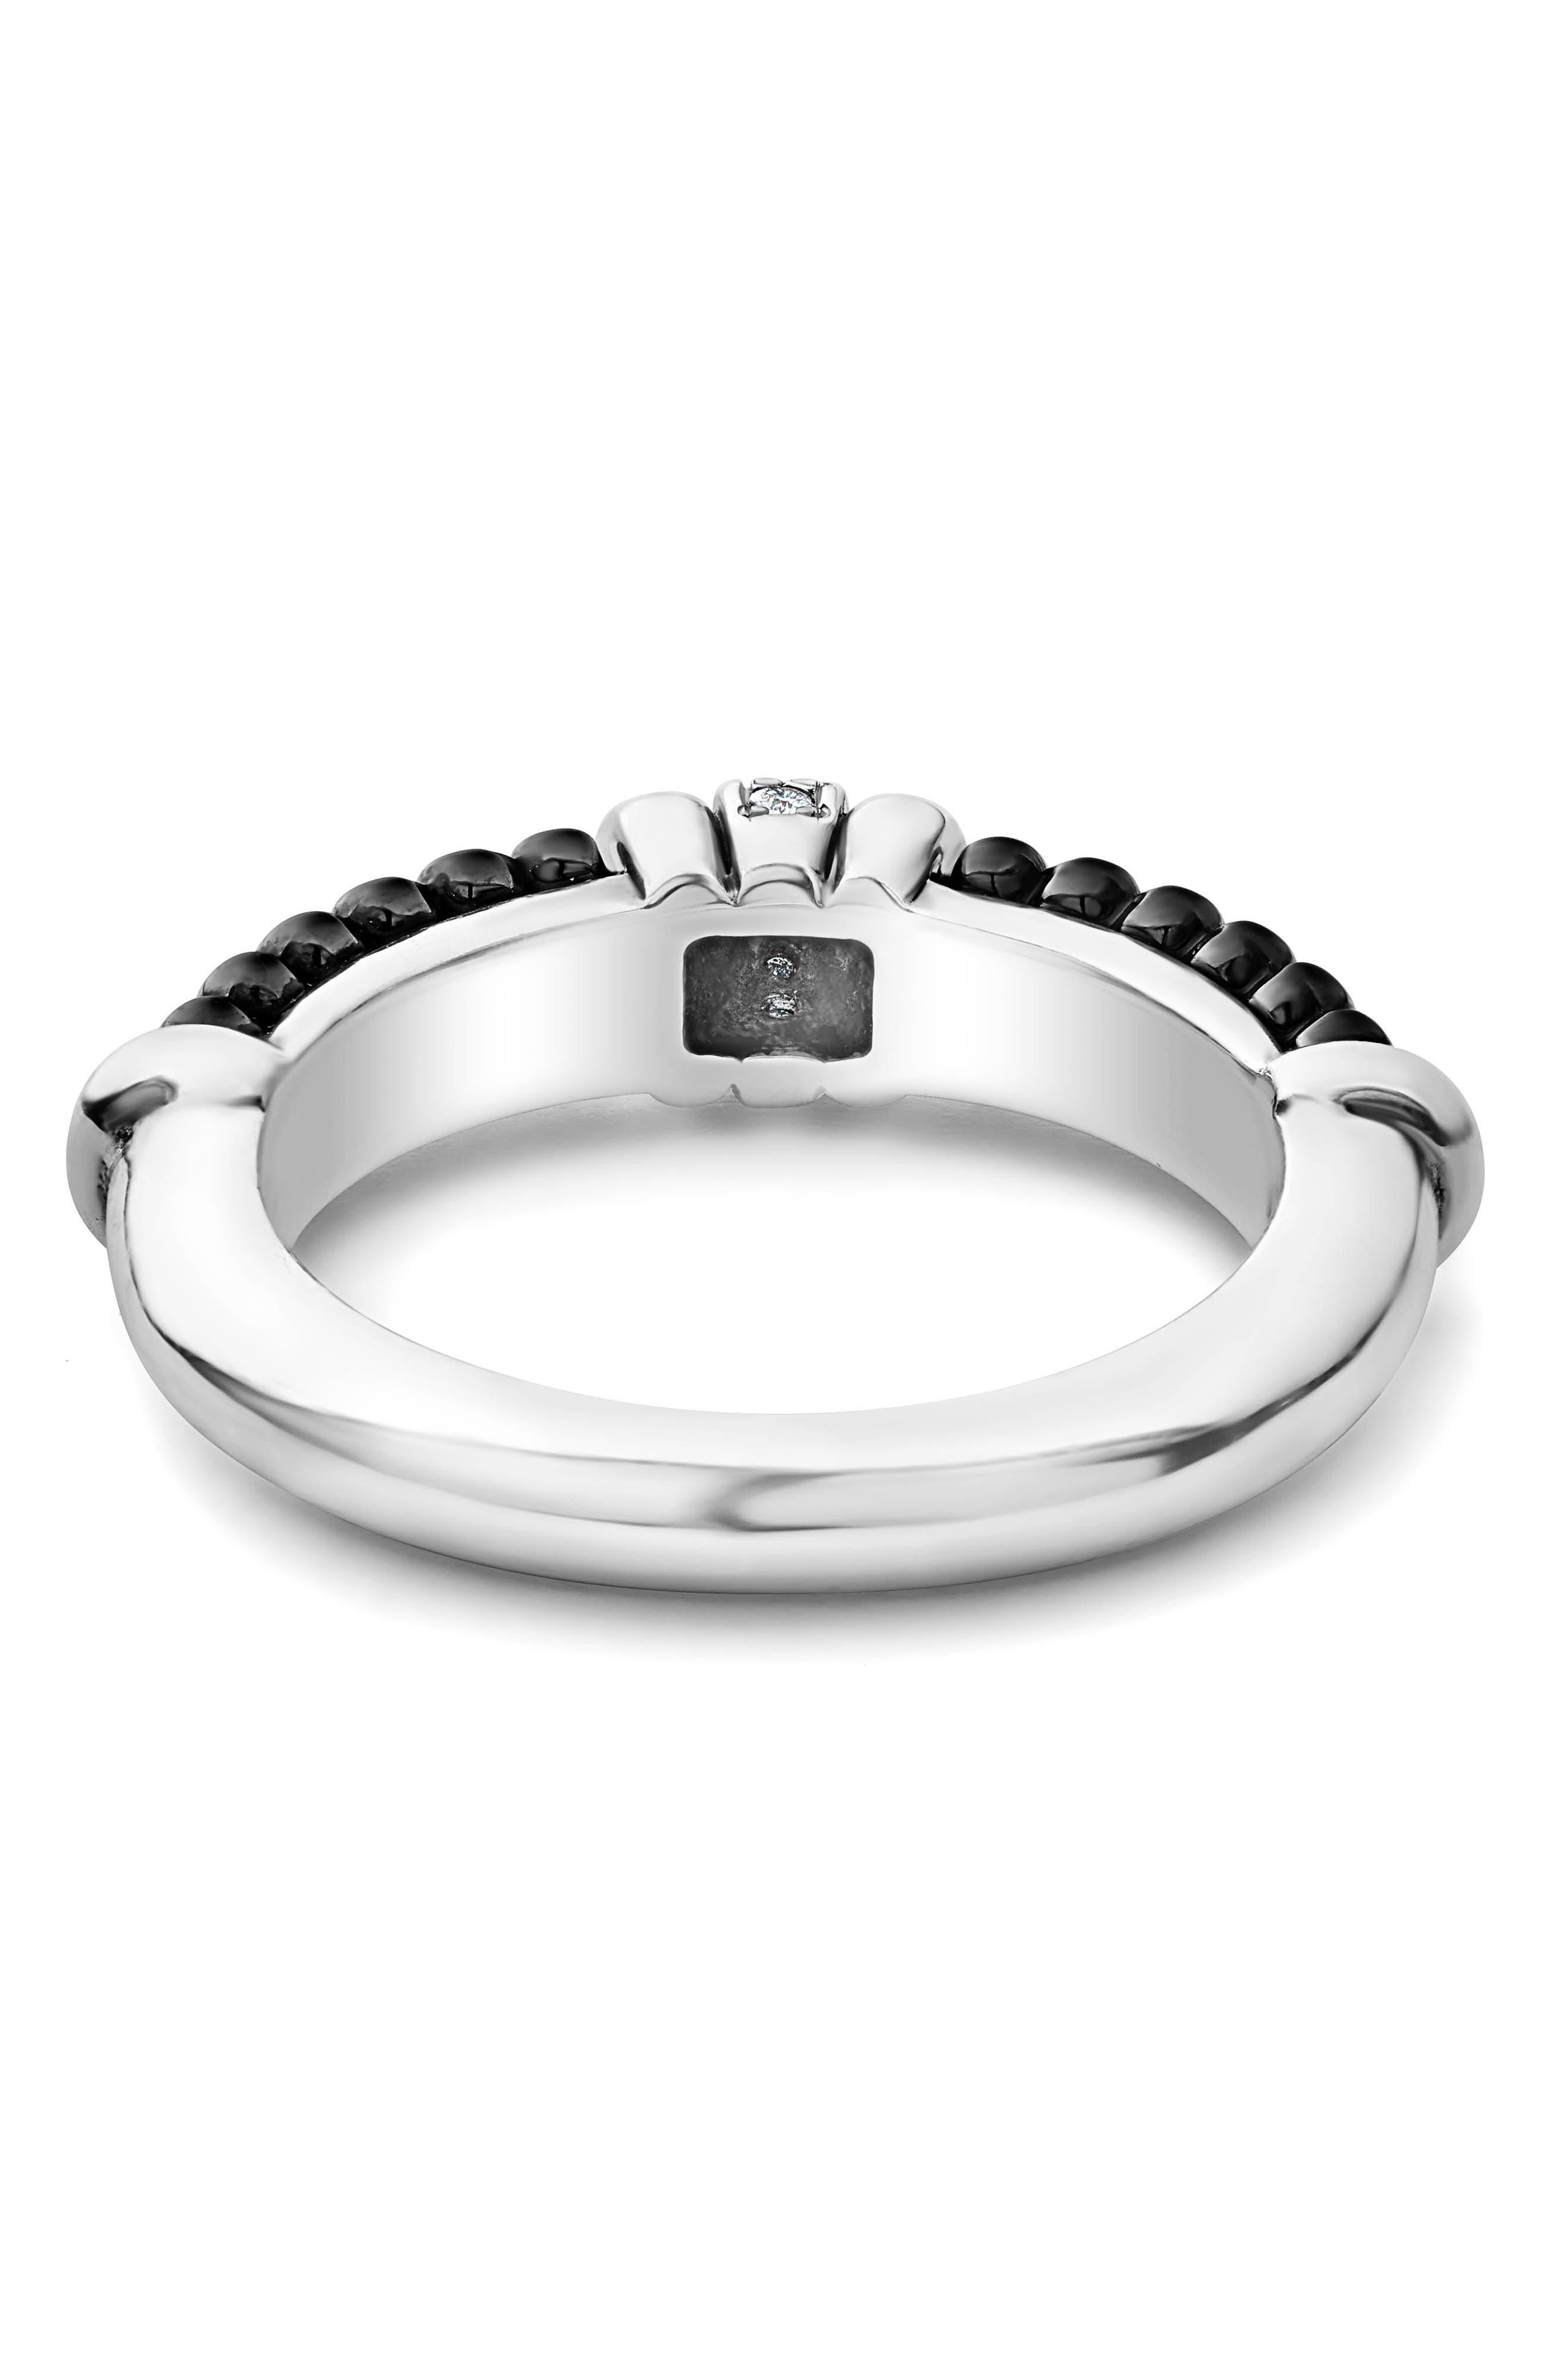 Black Caviar Diamond Stack Ring,                             Alternate thumbnail 4, color,                             SILVER/ BLACK